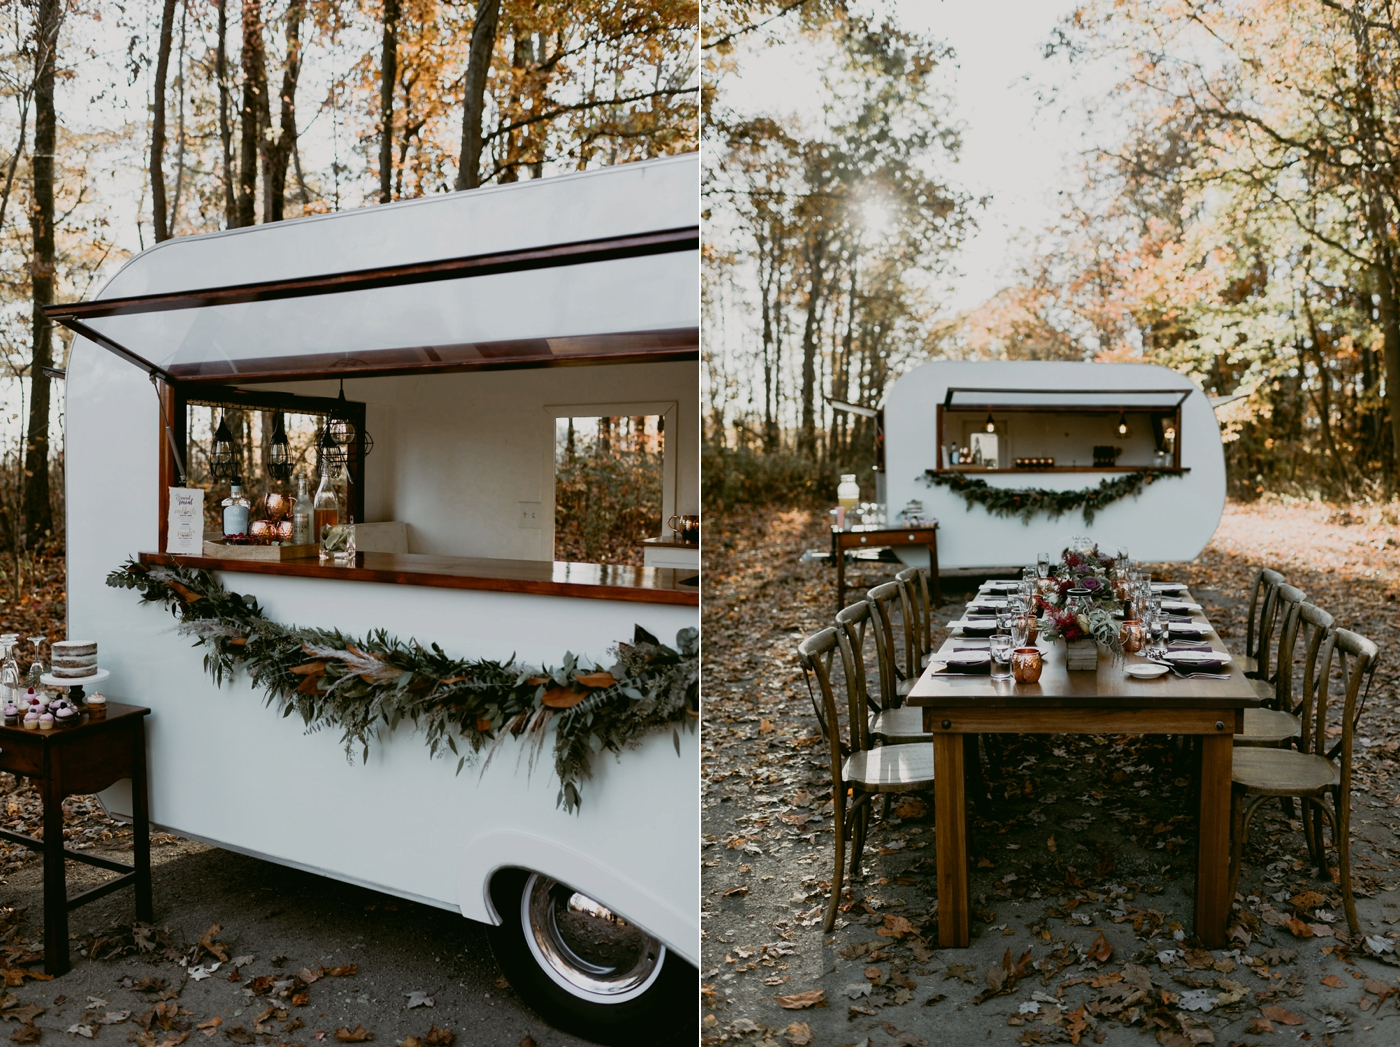 Autumn-Bridal-Shower-Vintage-Caravan-Styled-Shoot_MJPHOTO-2.jpg